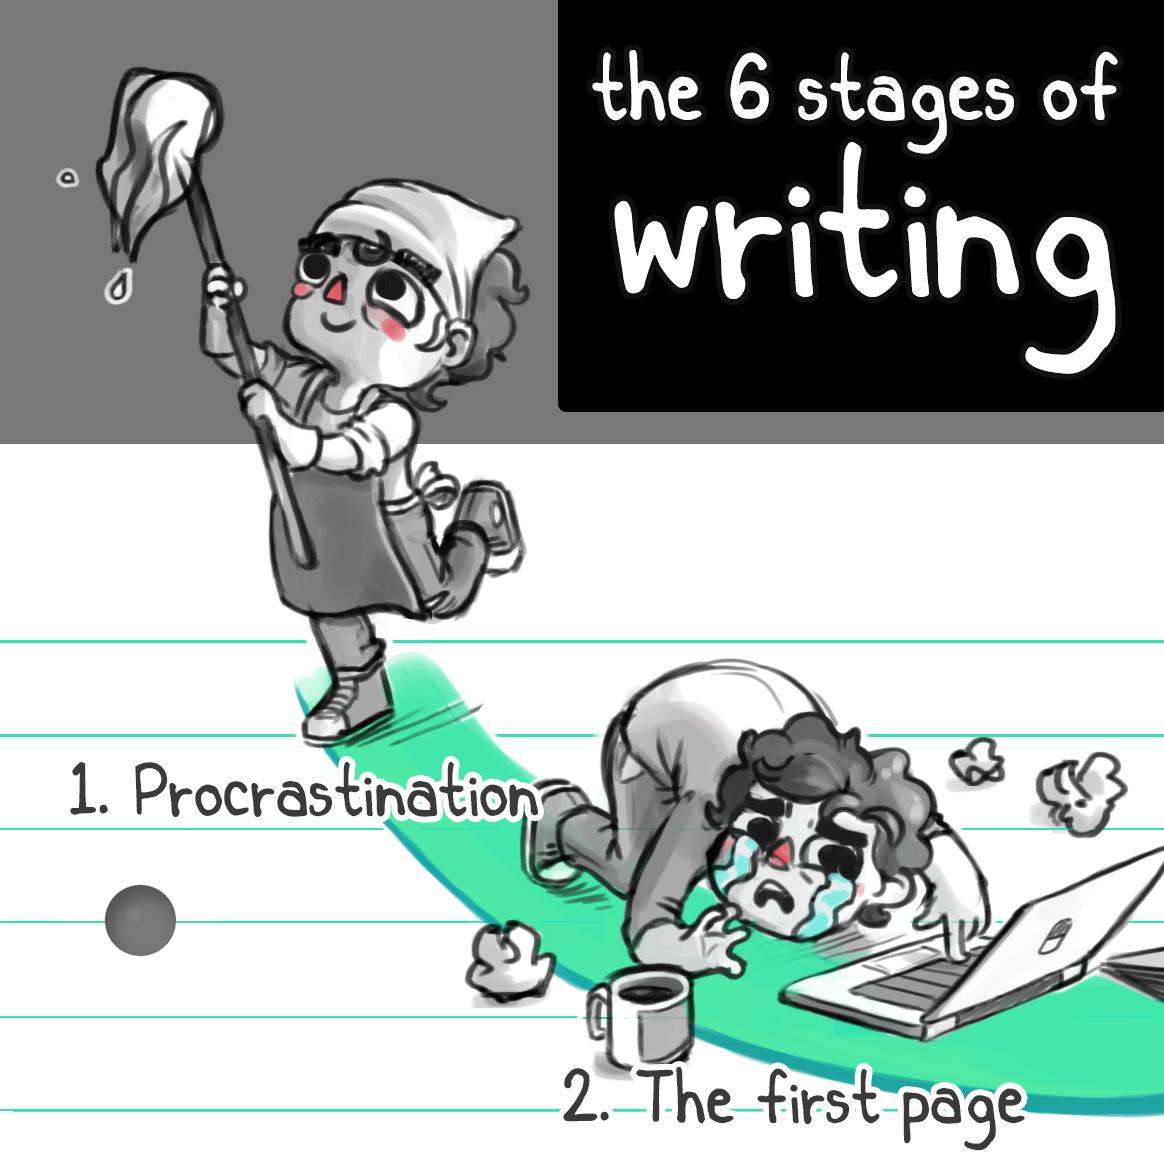 Essay_Writing_edit_4_01.png